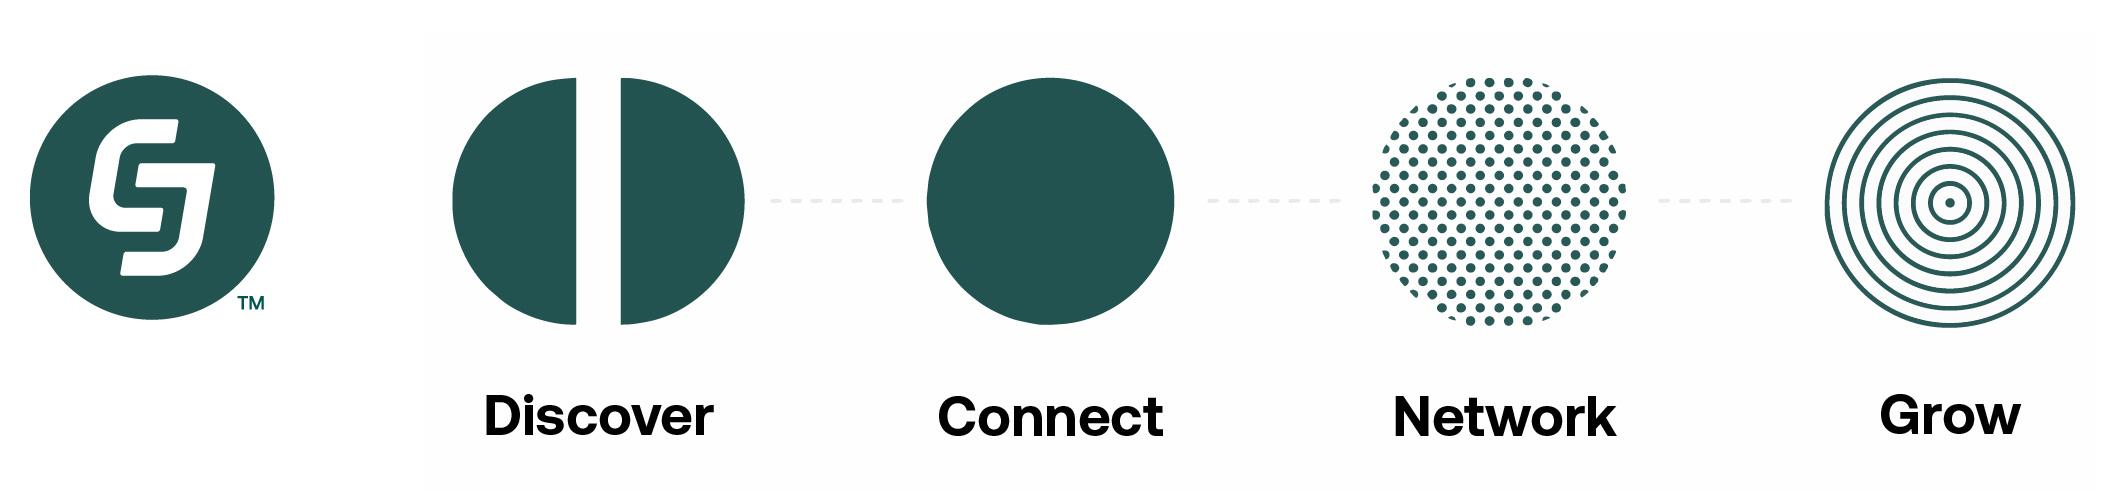 cj-affiliate-2021-brand-refresh-symbols-FINAL